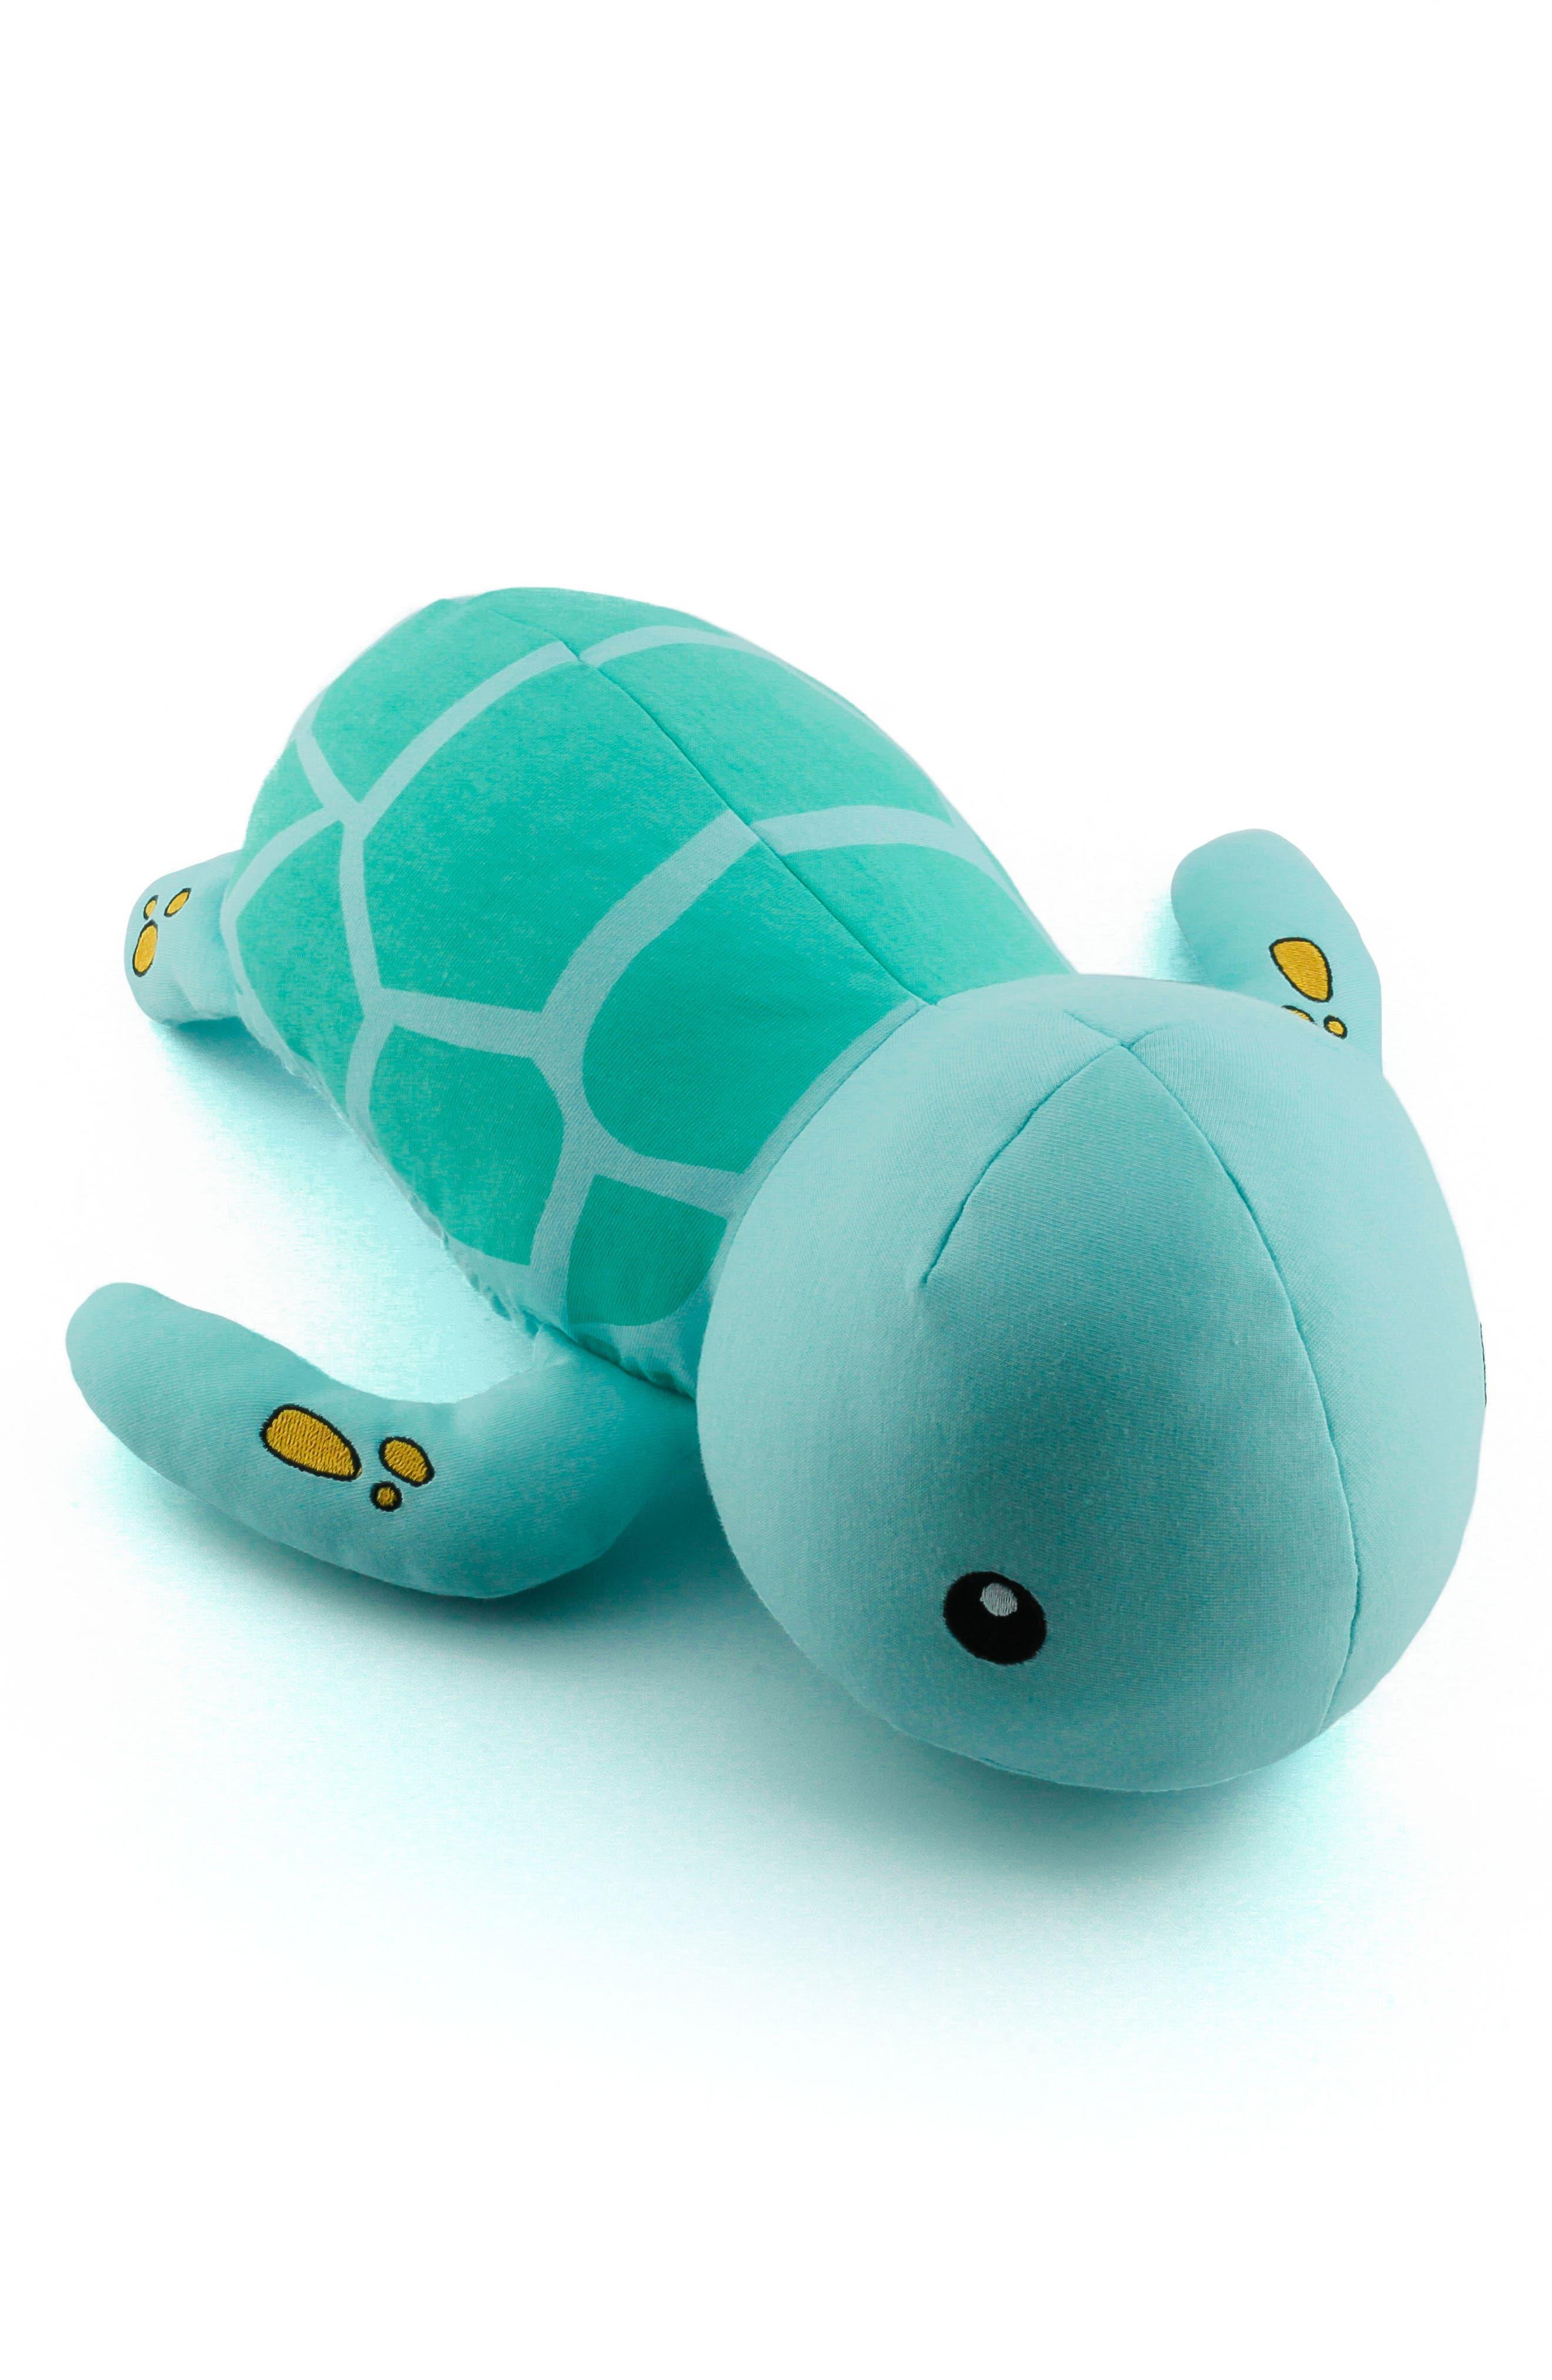 Tucker Turtle Stuffed Animal,                             Alternate thumbnail 8, color,                             Blue/ Green